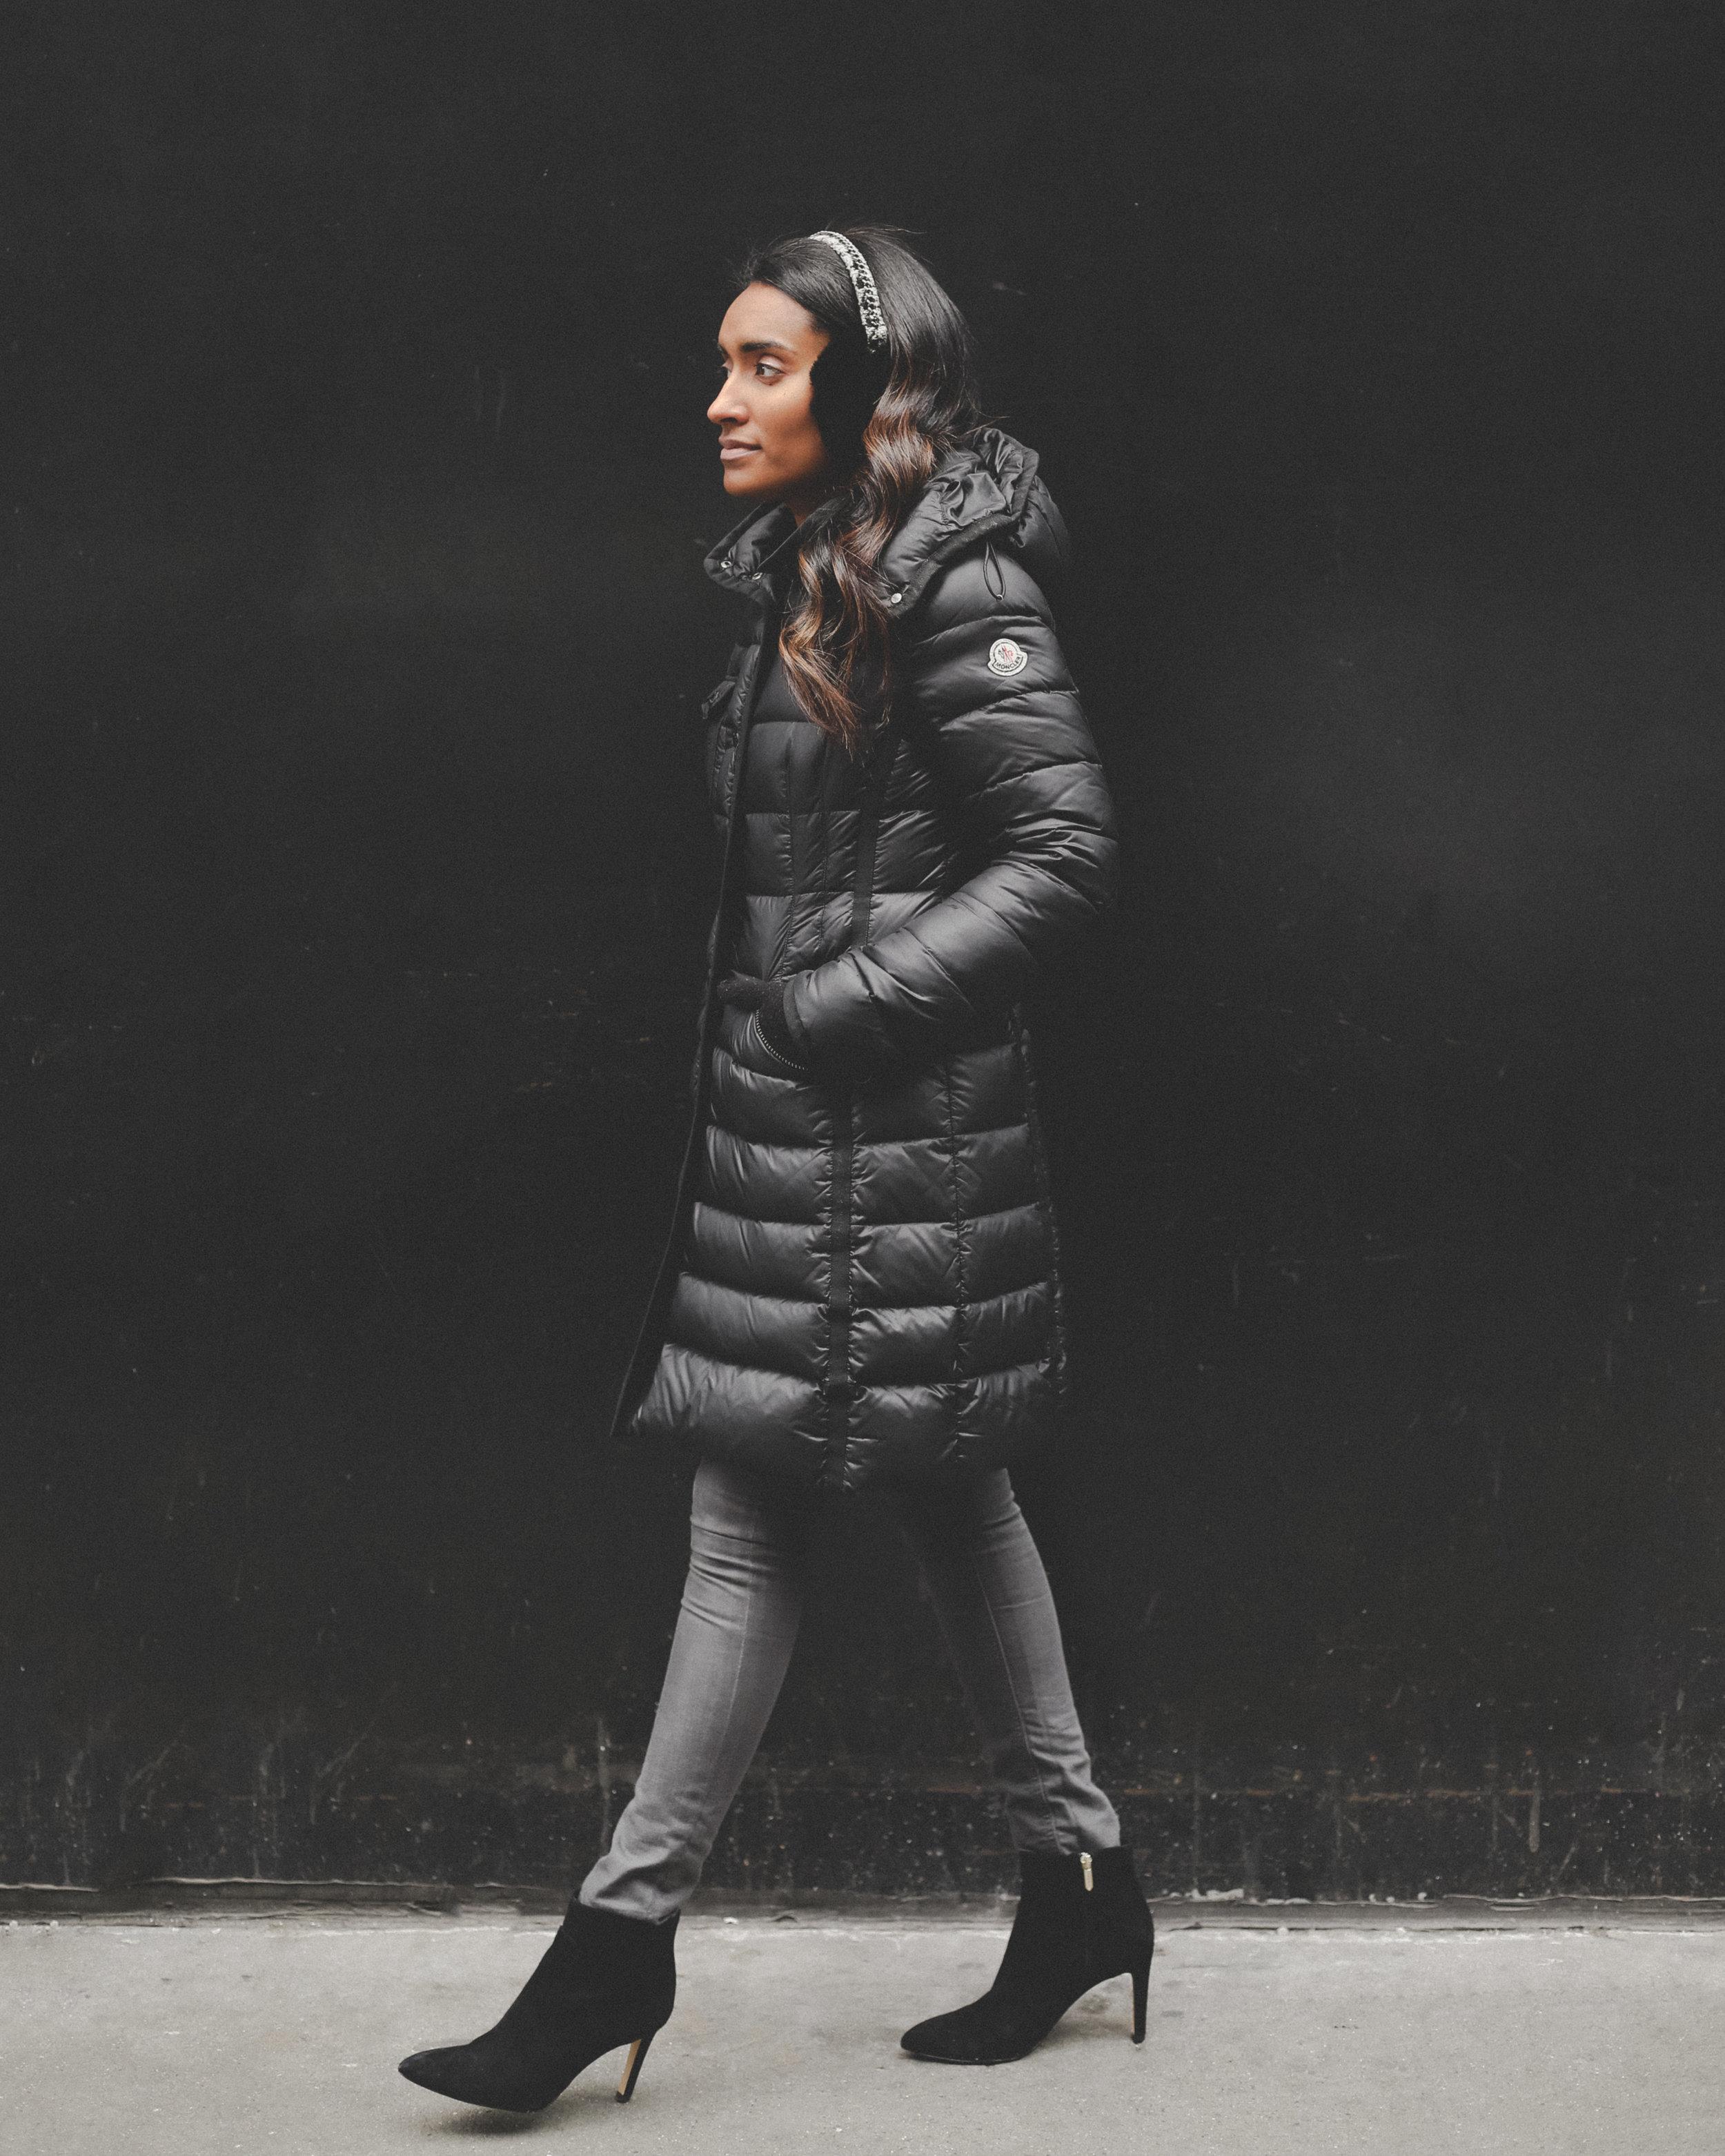 Krys posing with a stylish puffy jacket.